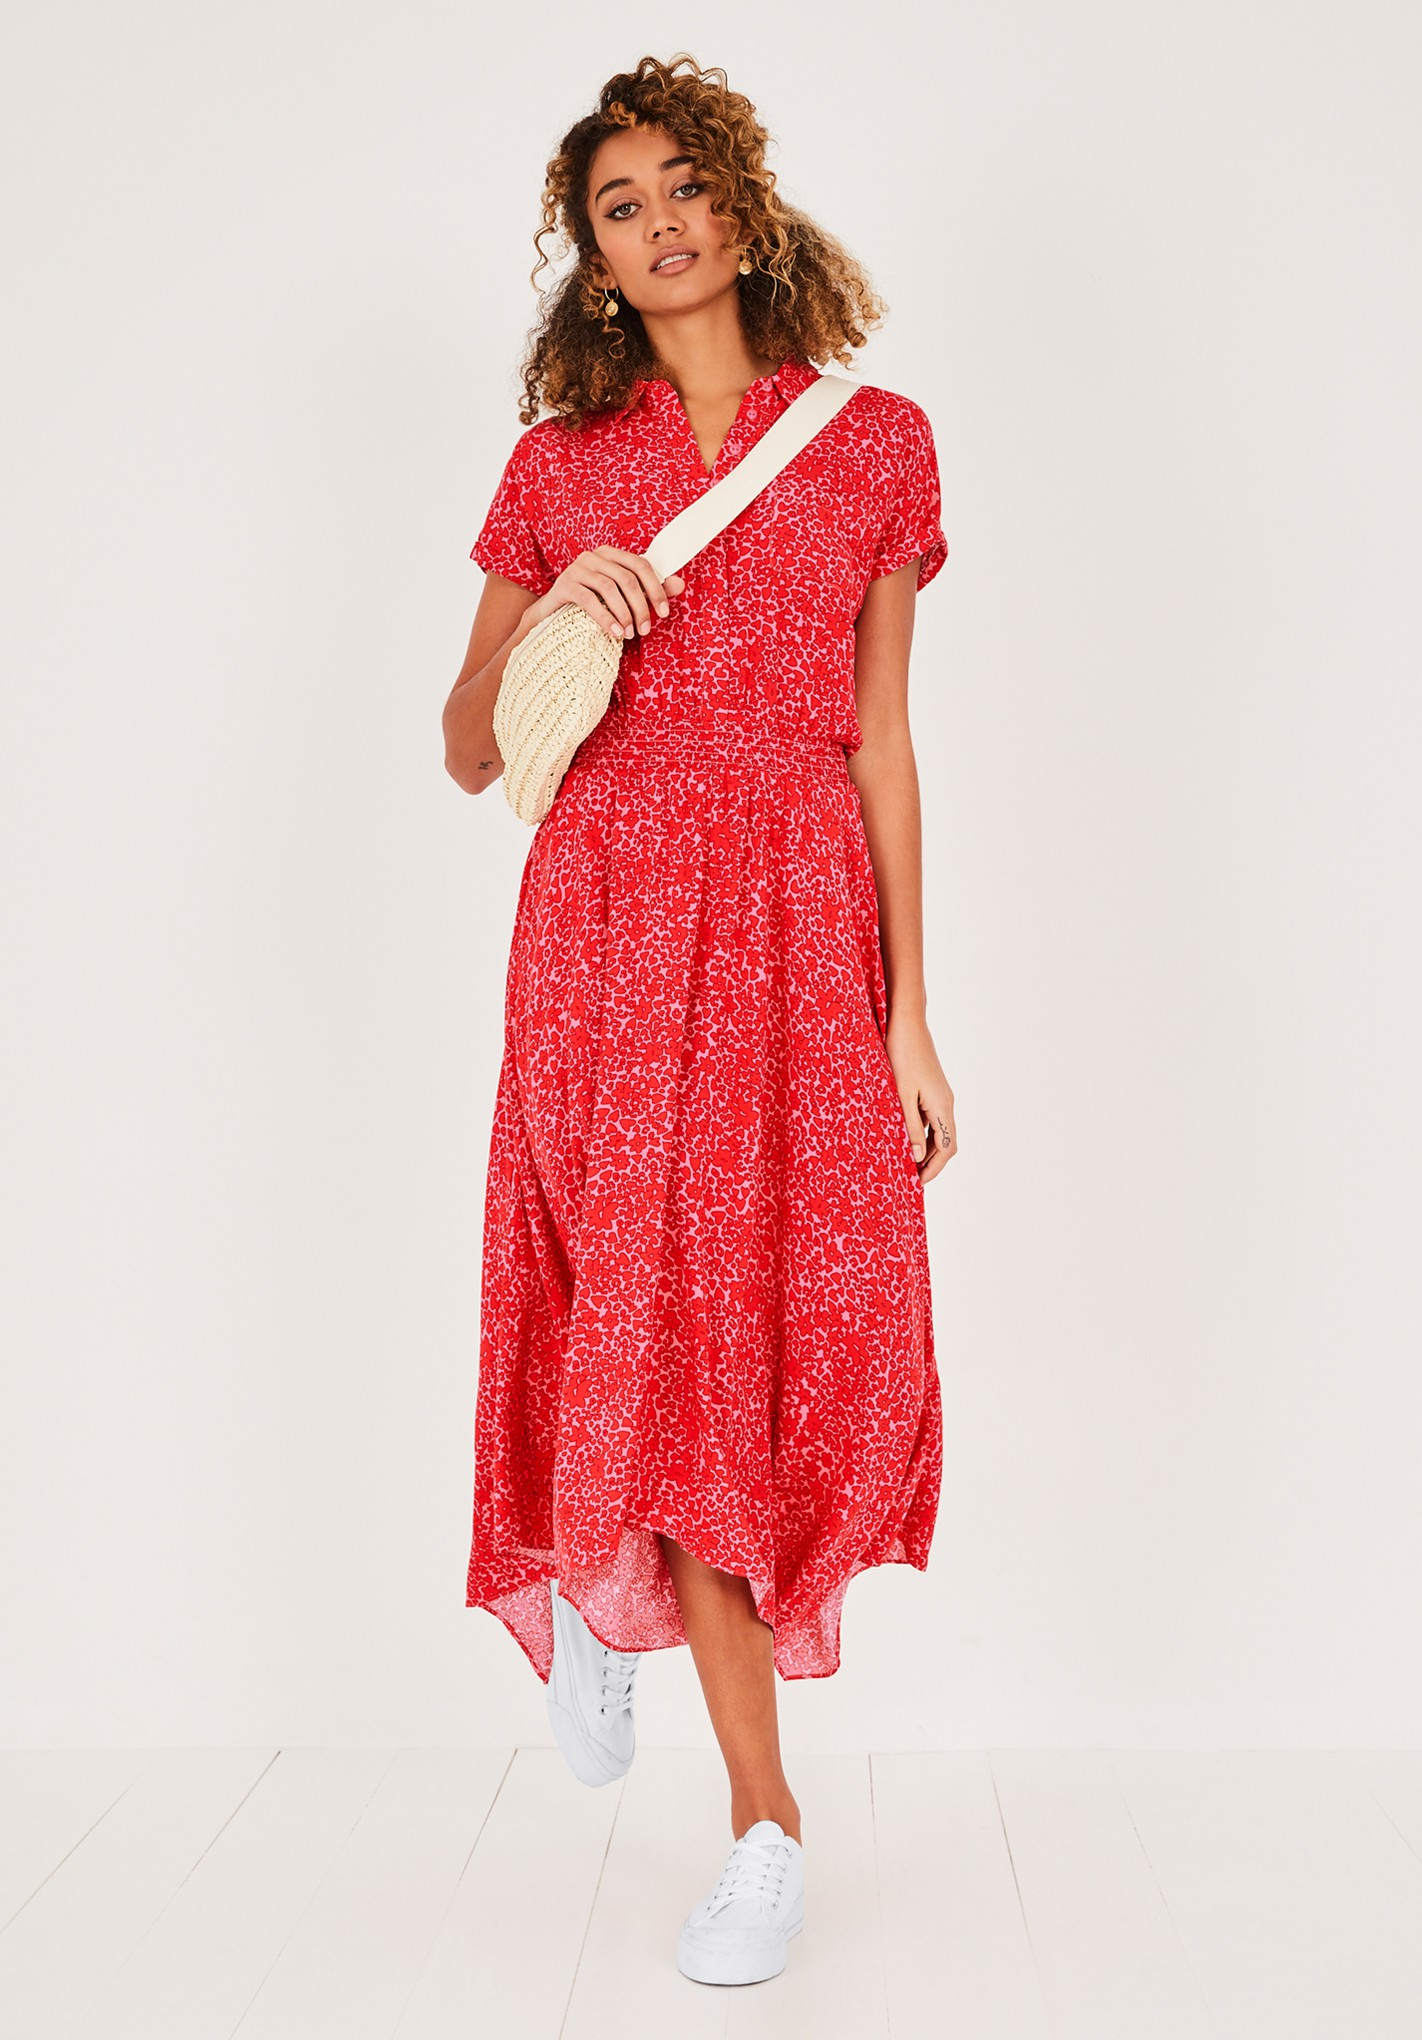 hush floral-animal-pink-red kensington shirt dress pink/red floral